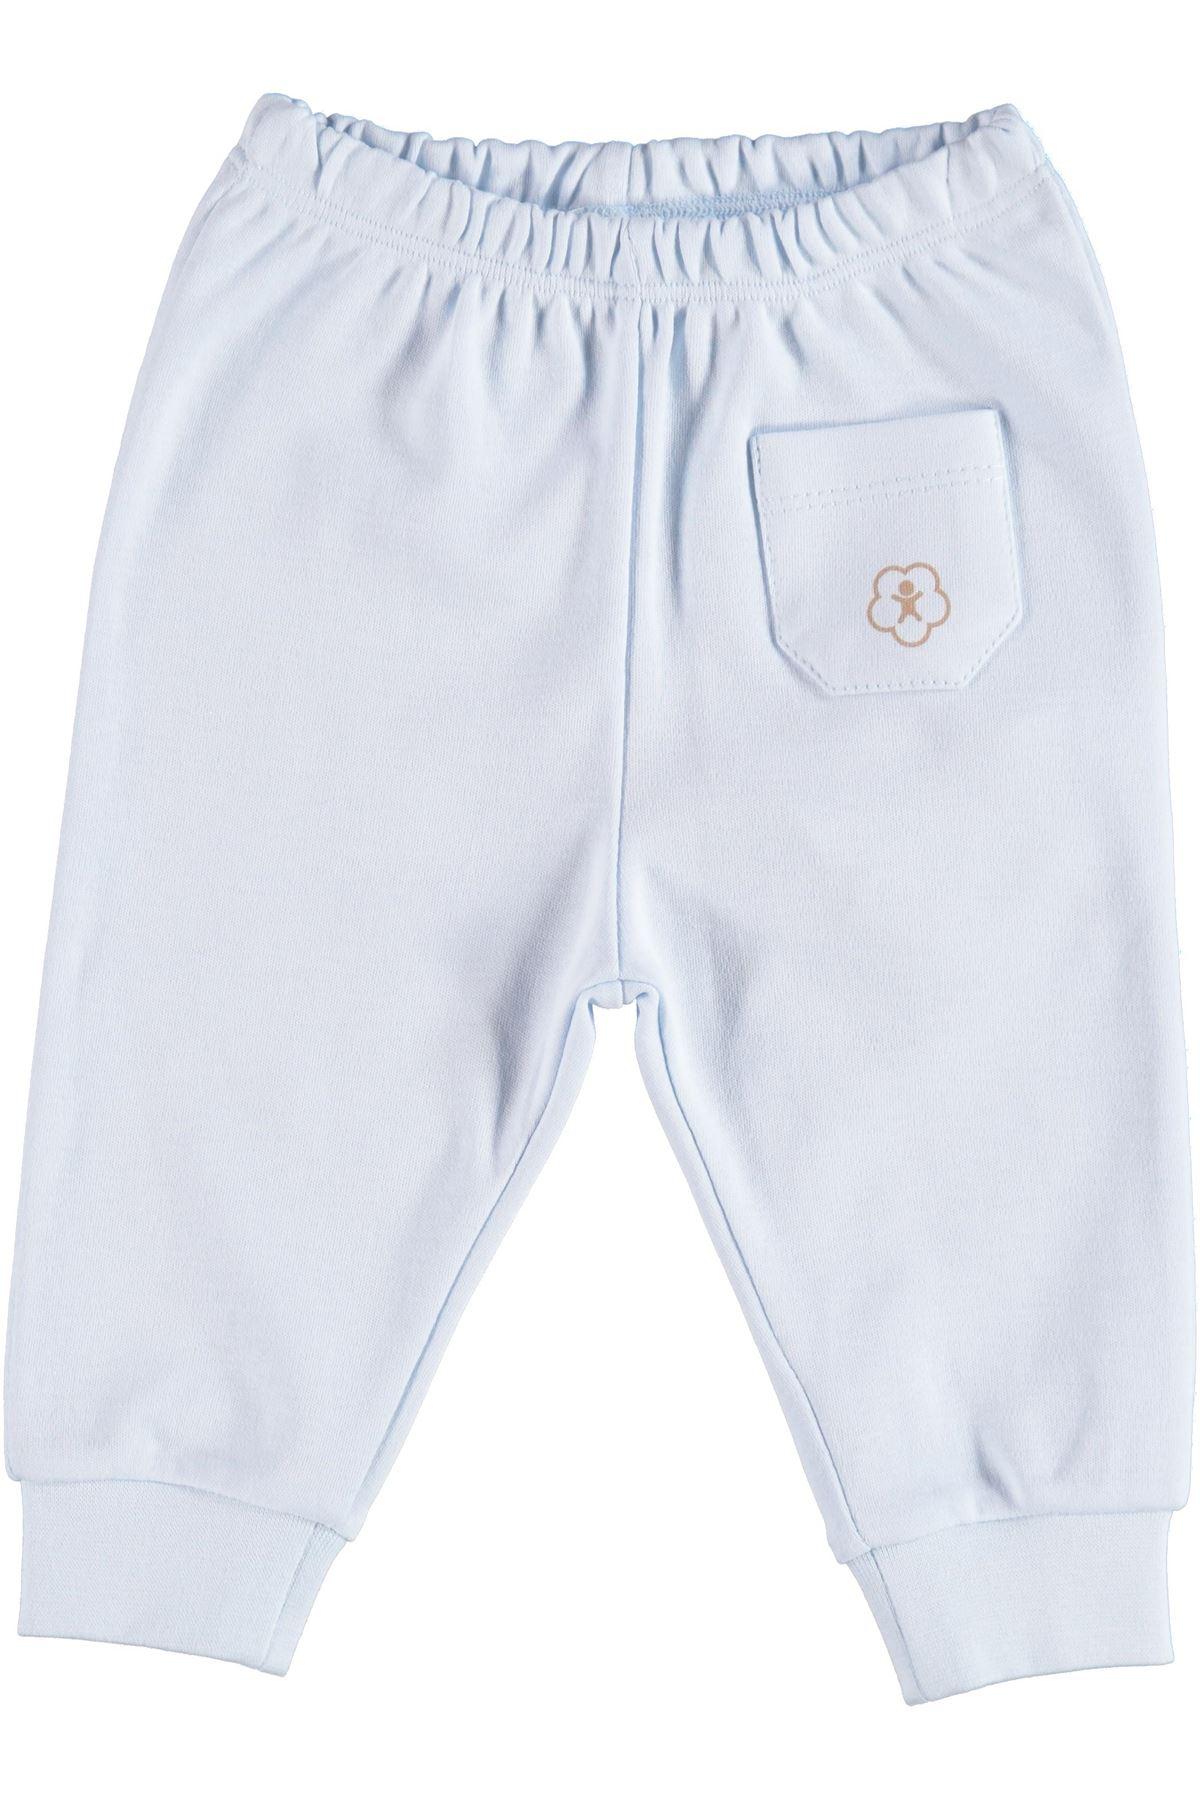 Bibaby Basic Patiksiz Pantolon 57500 Mavi